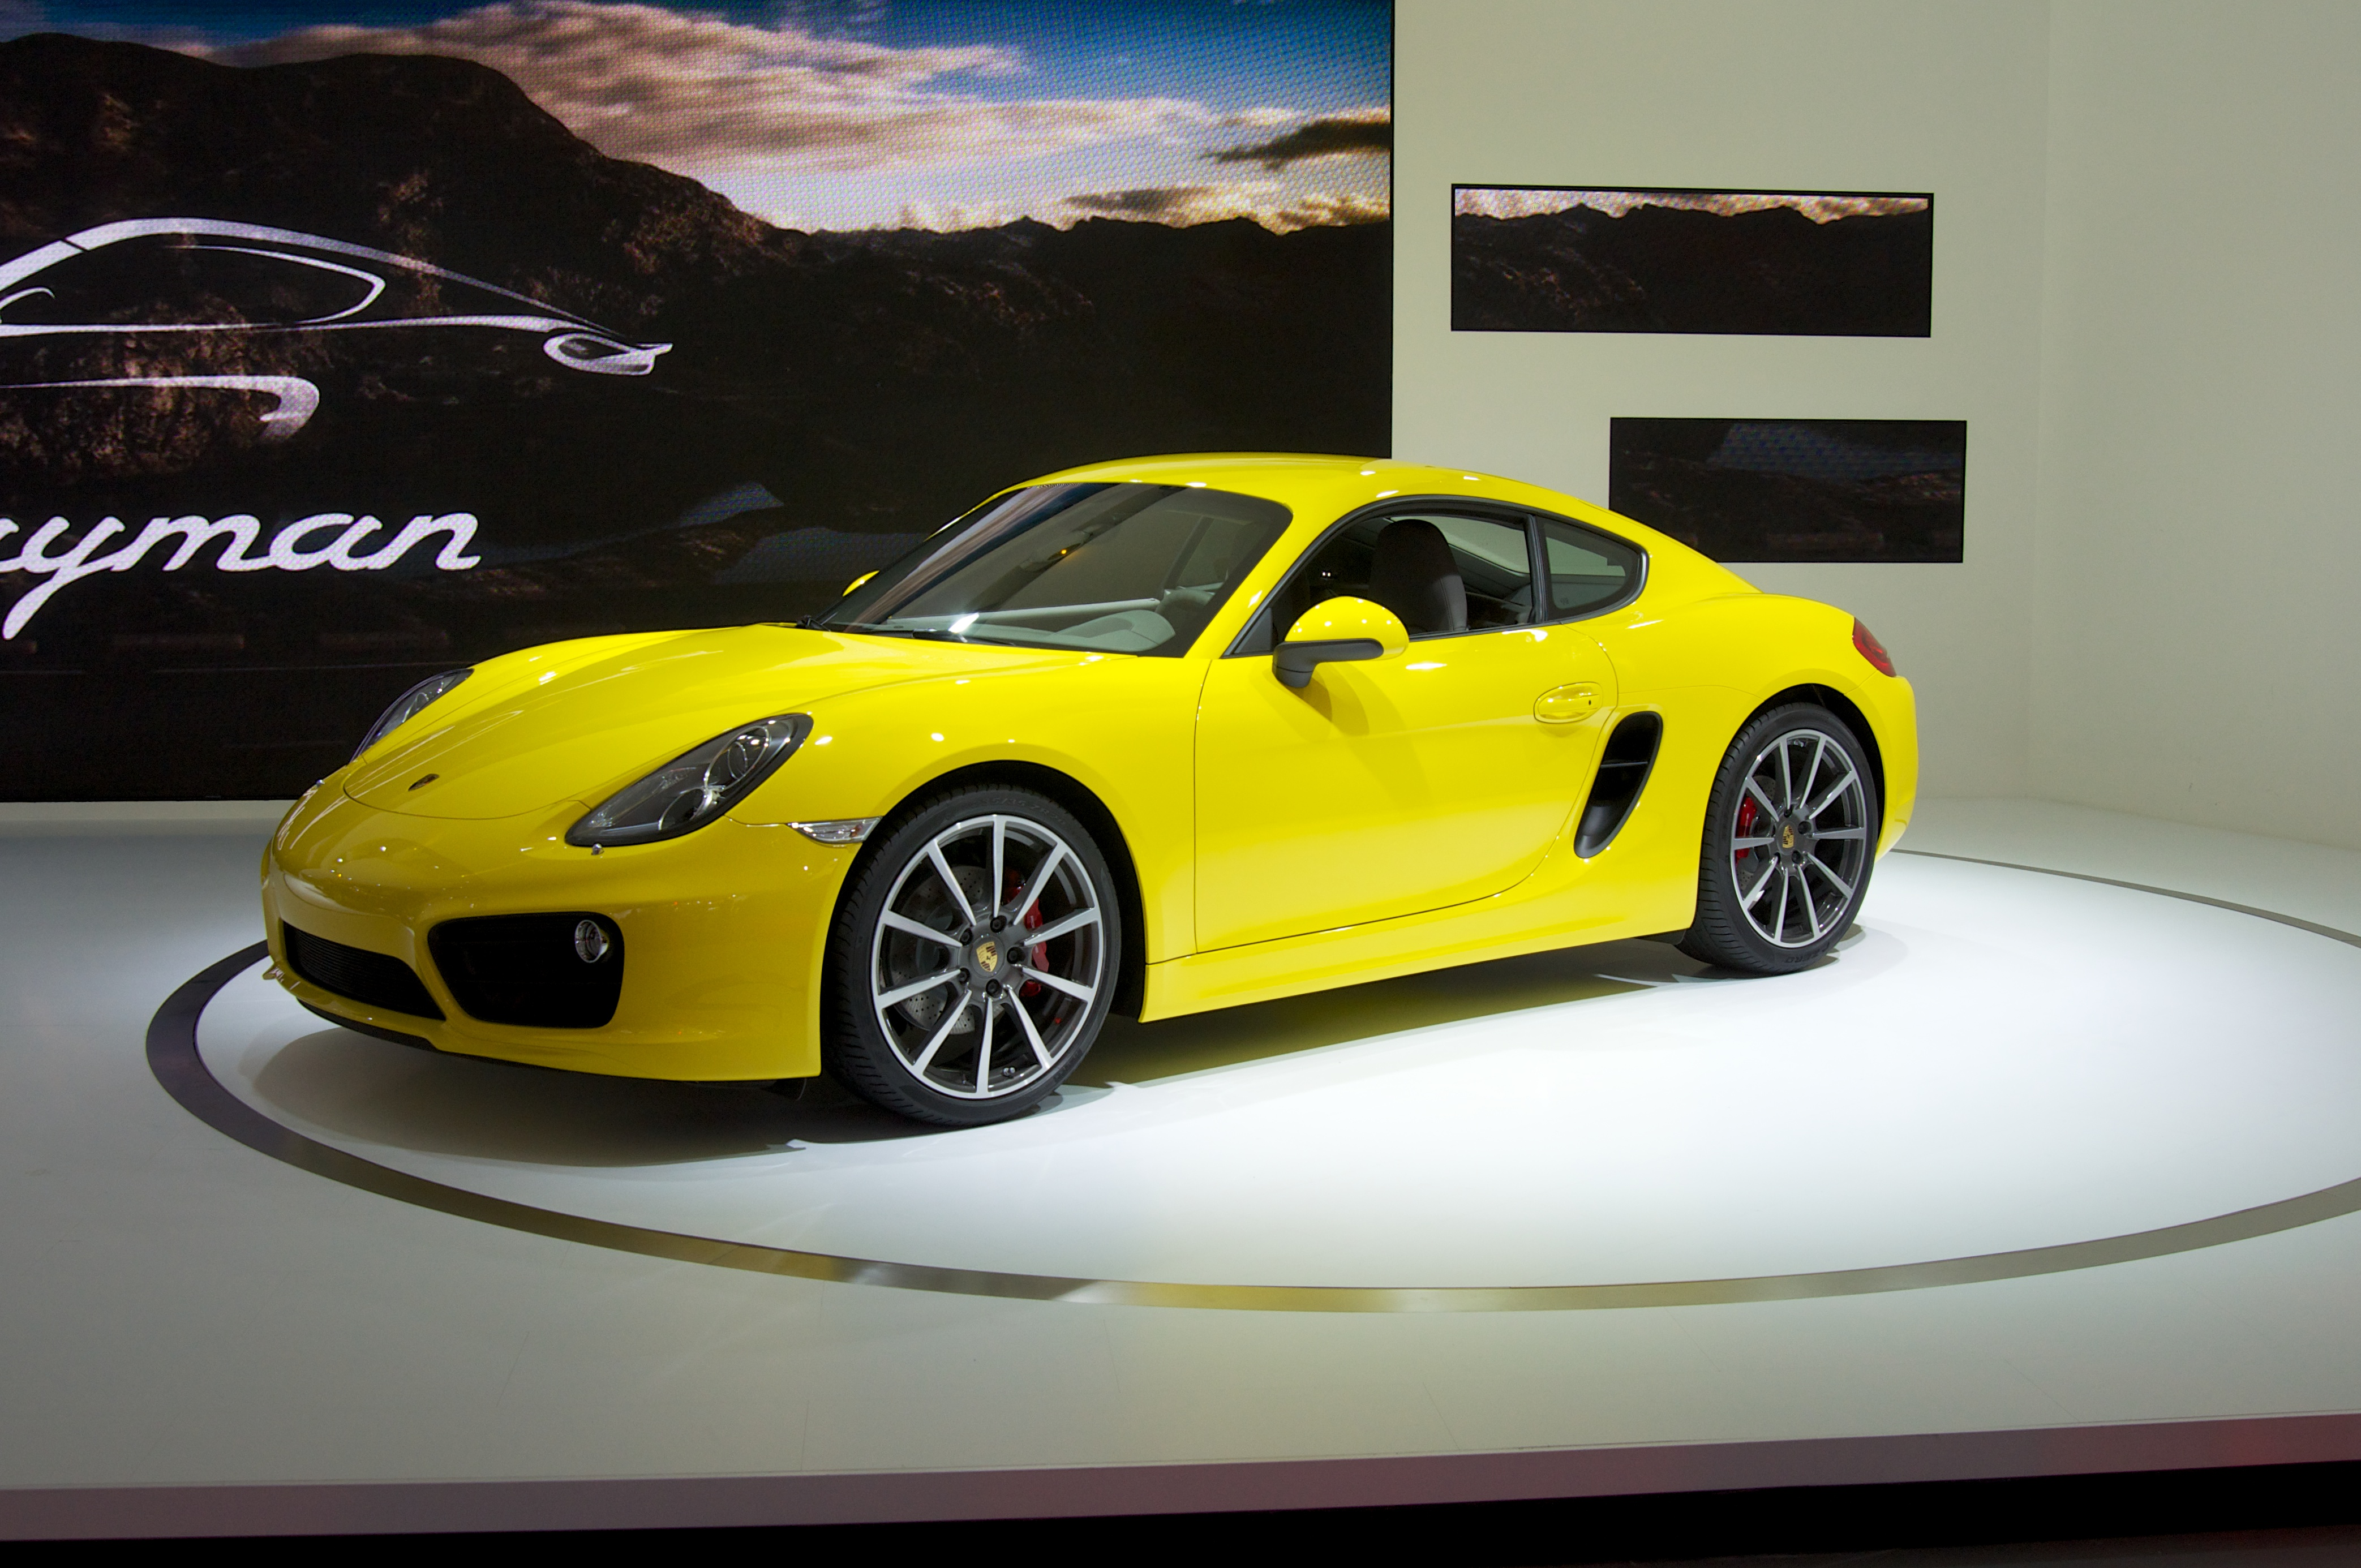 2013-porsche-cayman-yellow-2012-los-angeles-auto-show-by-stevelyon_03